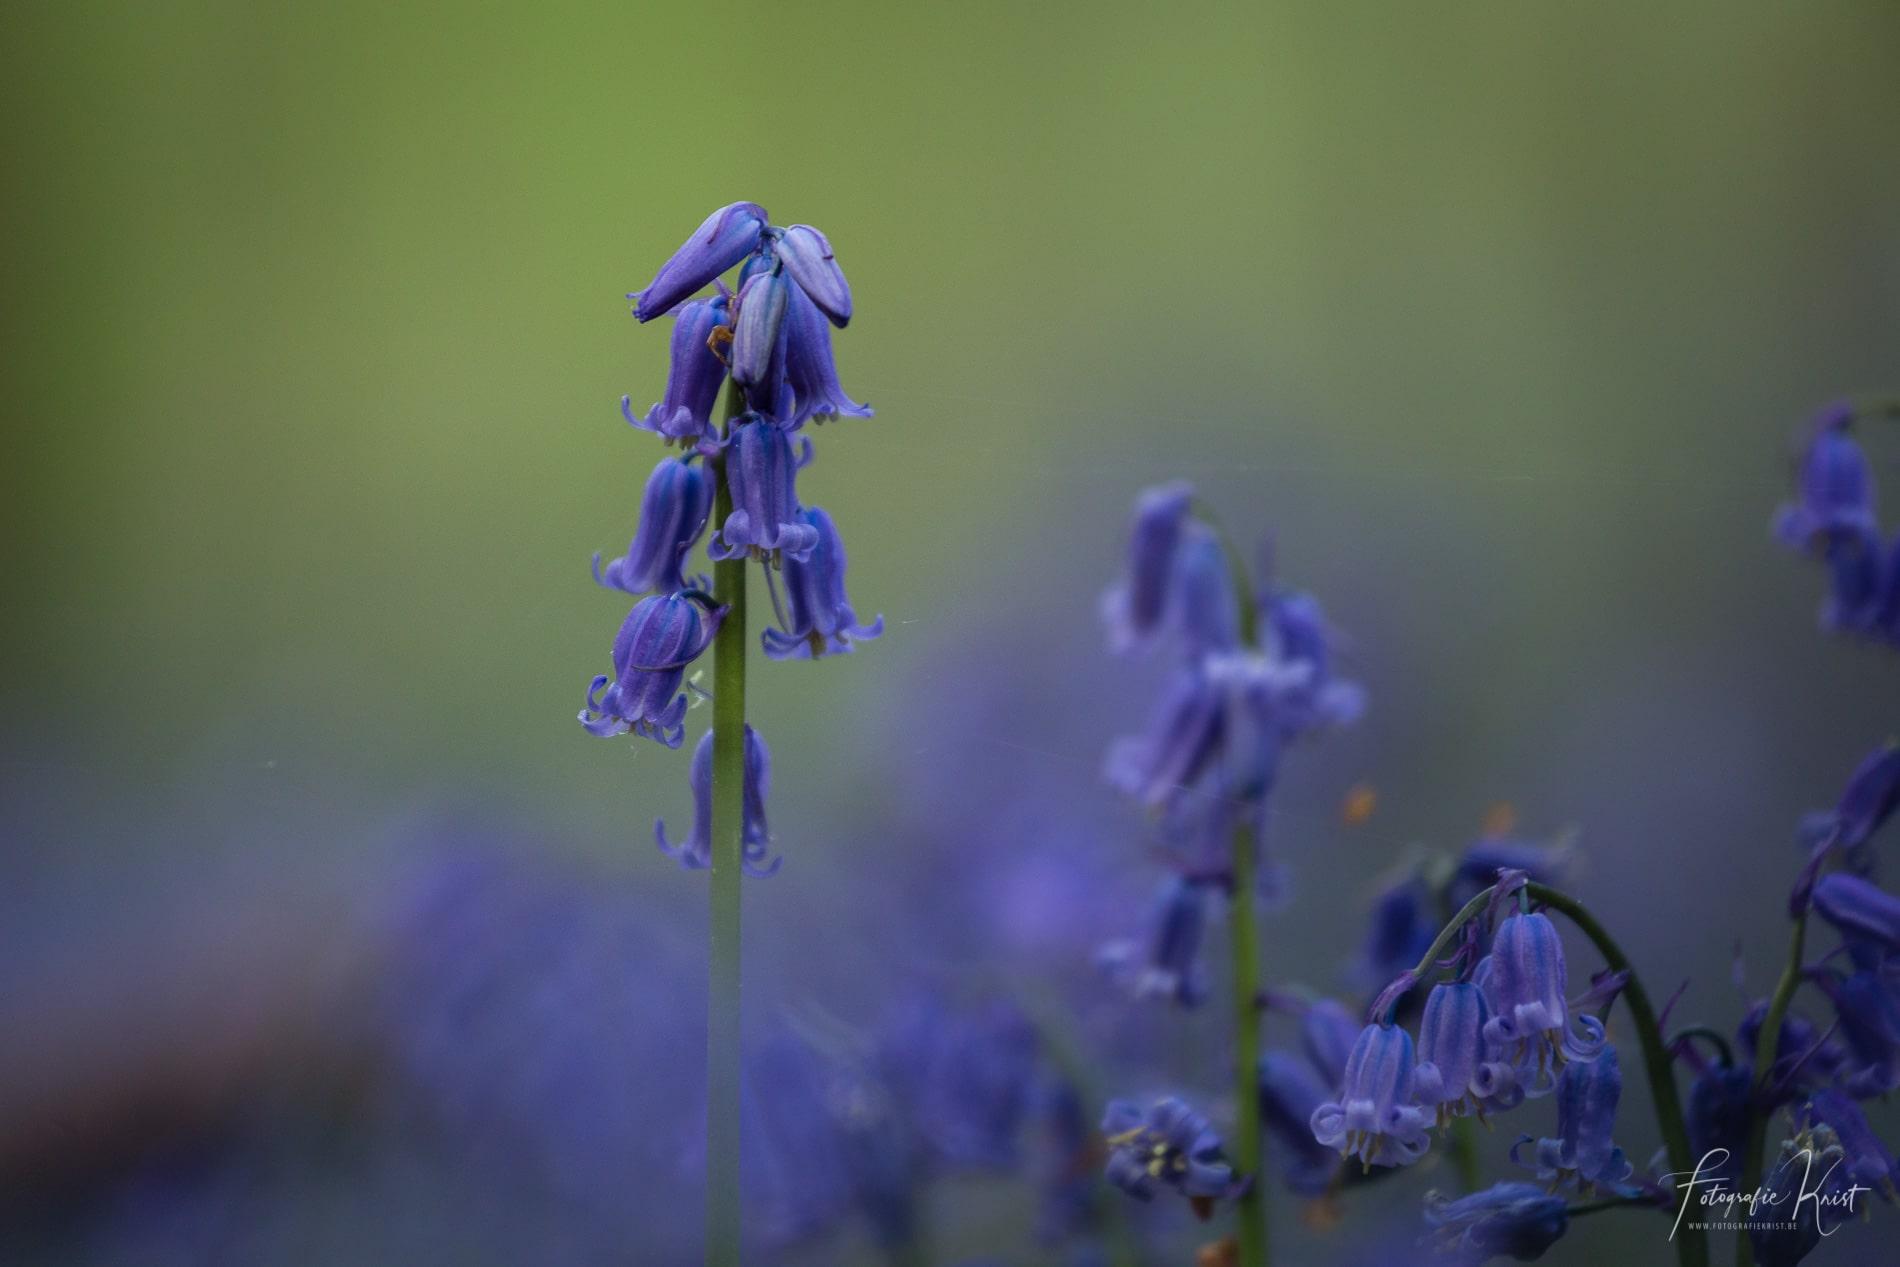 Hallerbos Boshyacinten - Bluebells